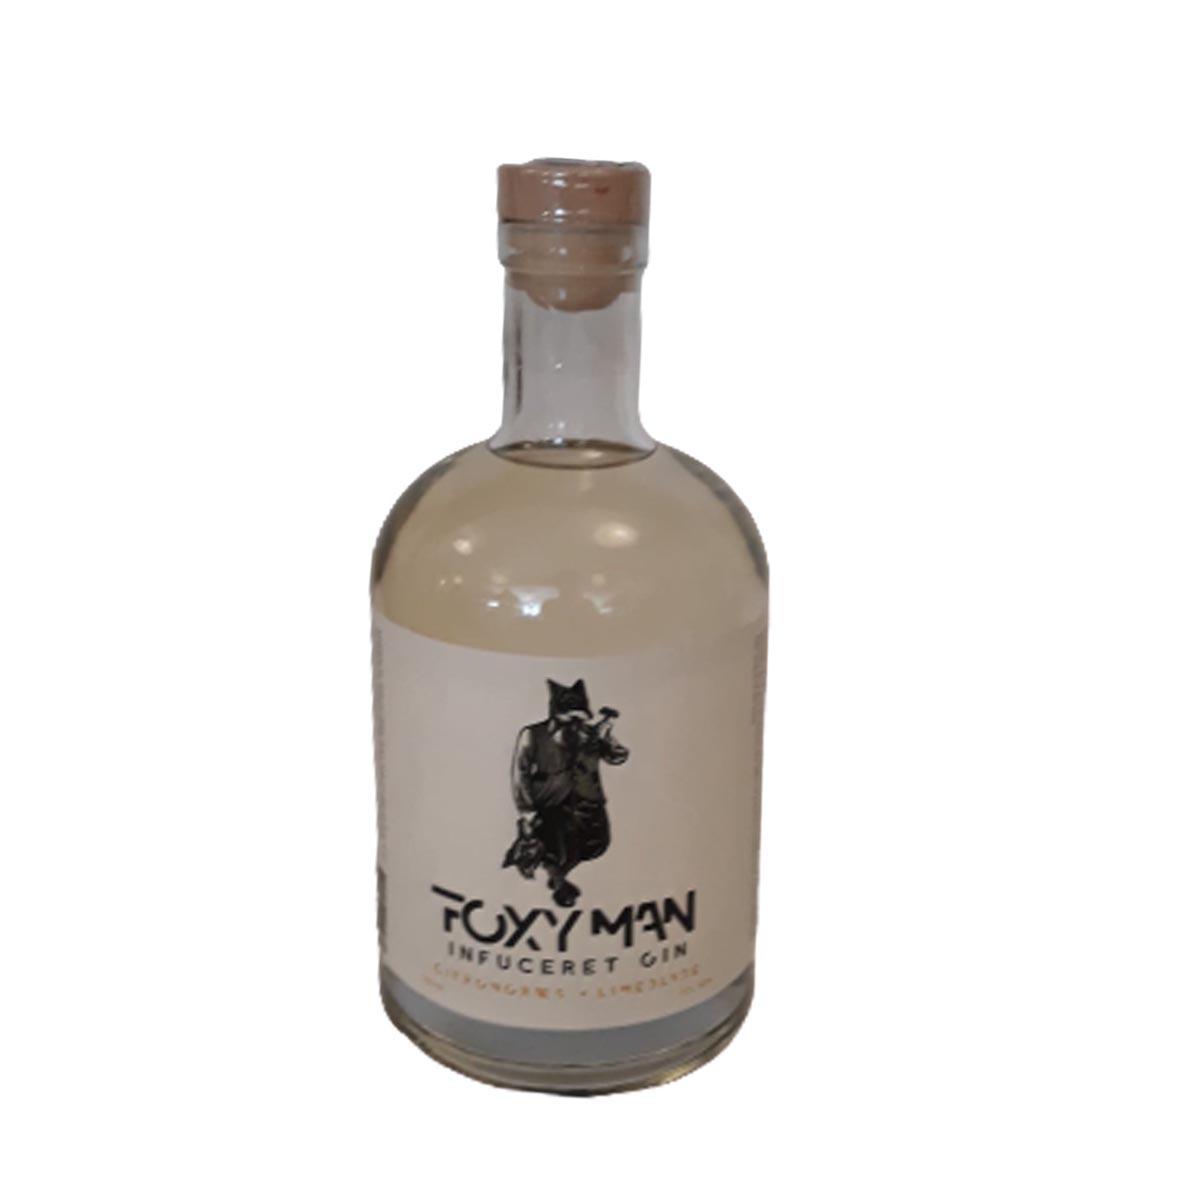 Foxy Man Citrongræs Limeblade Gin